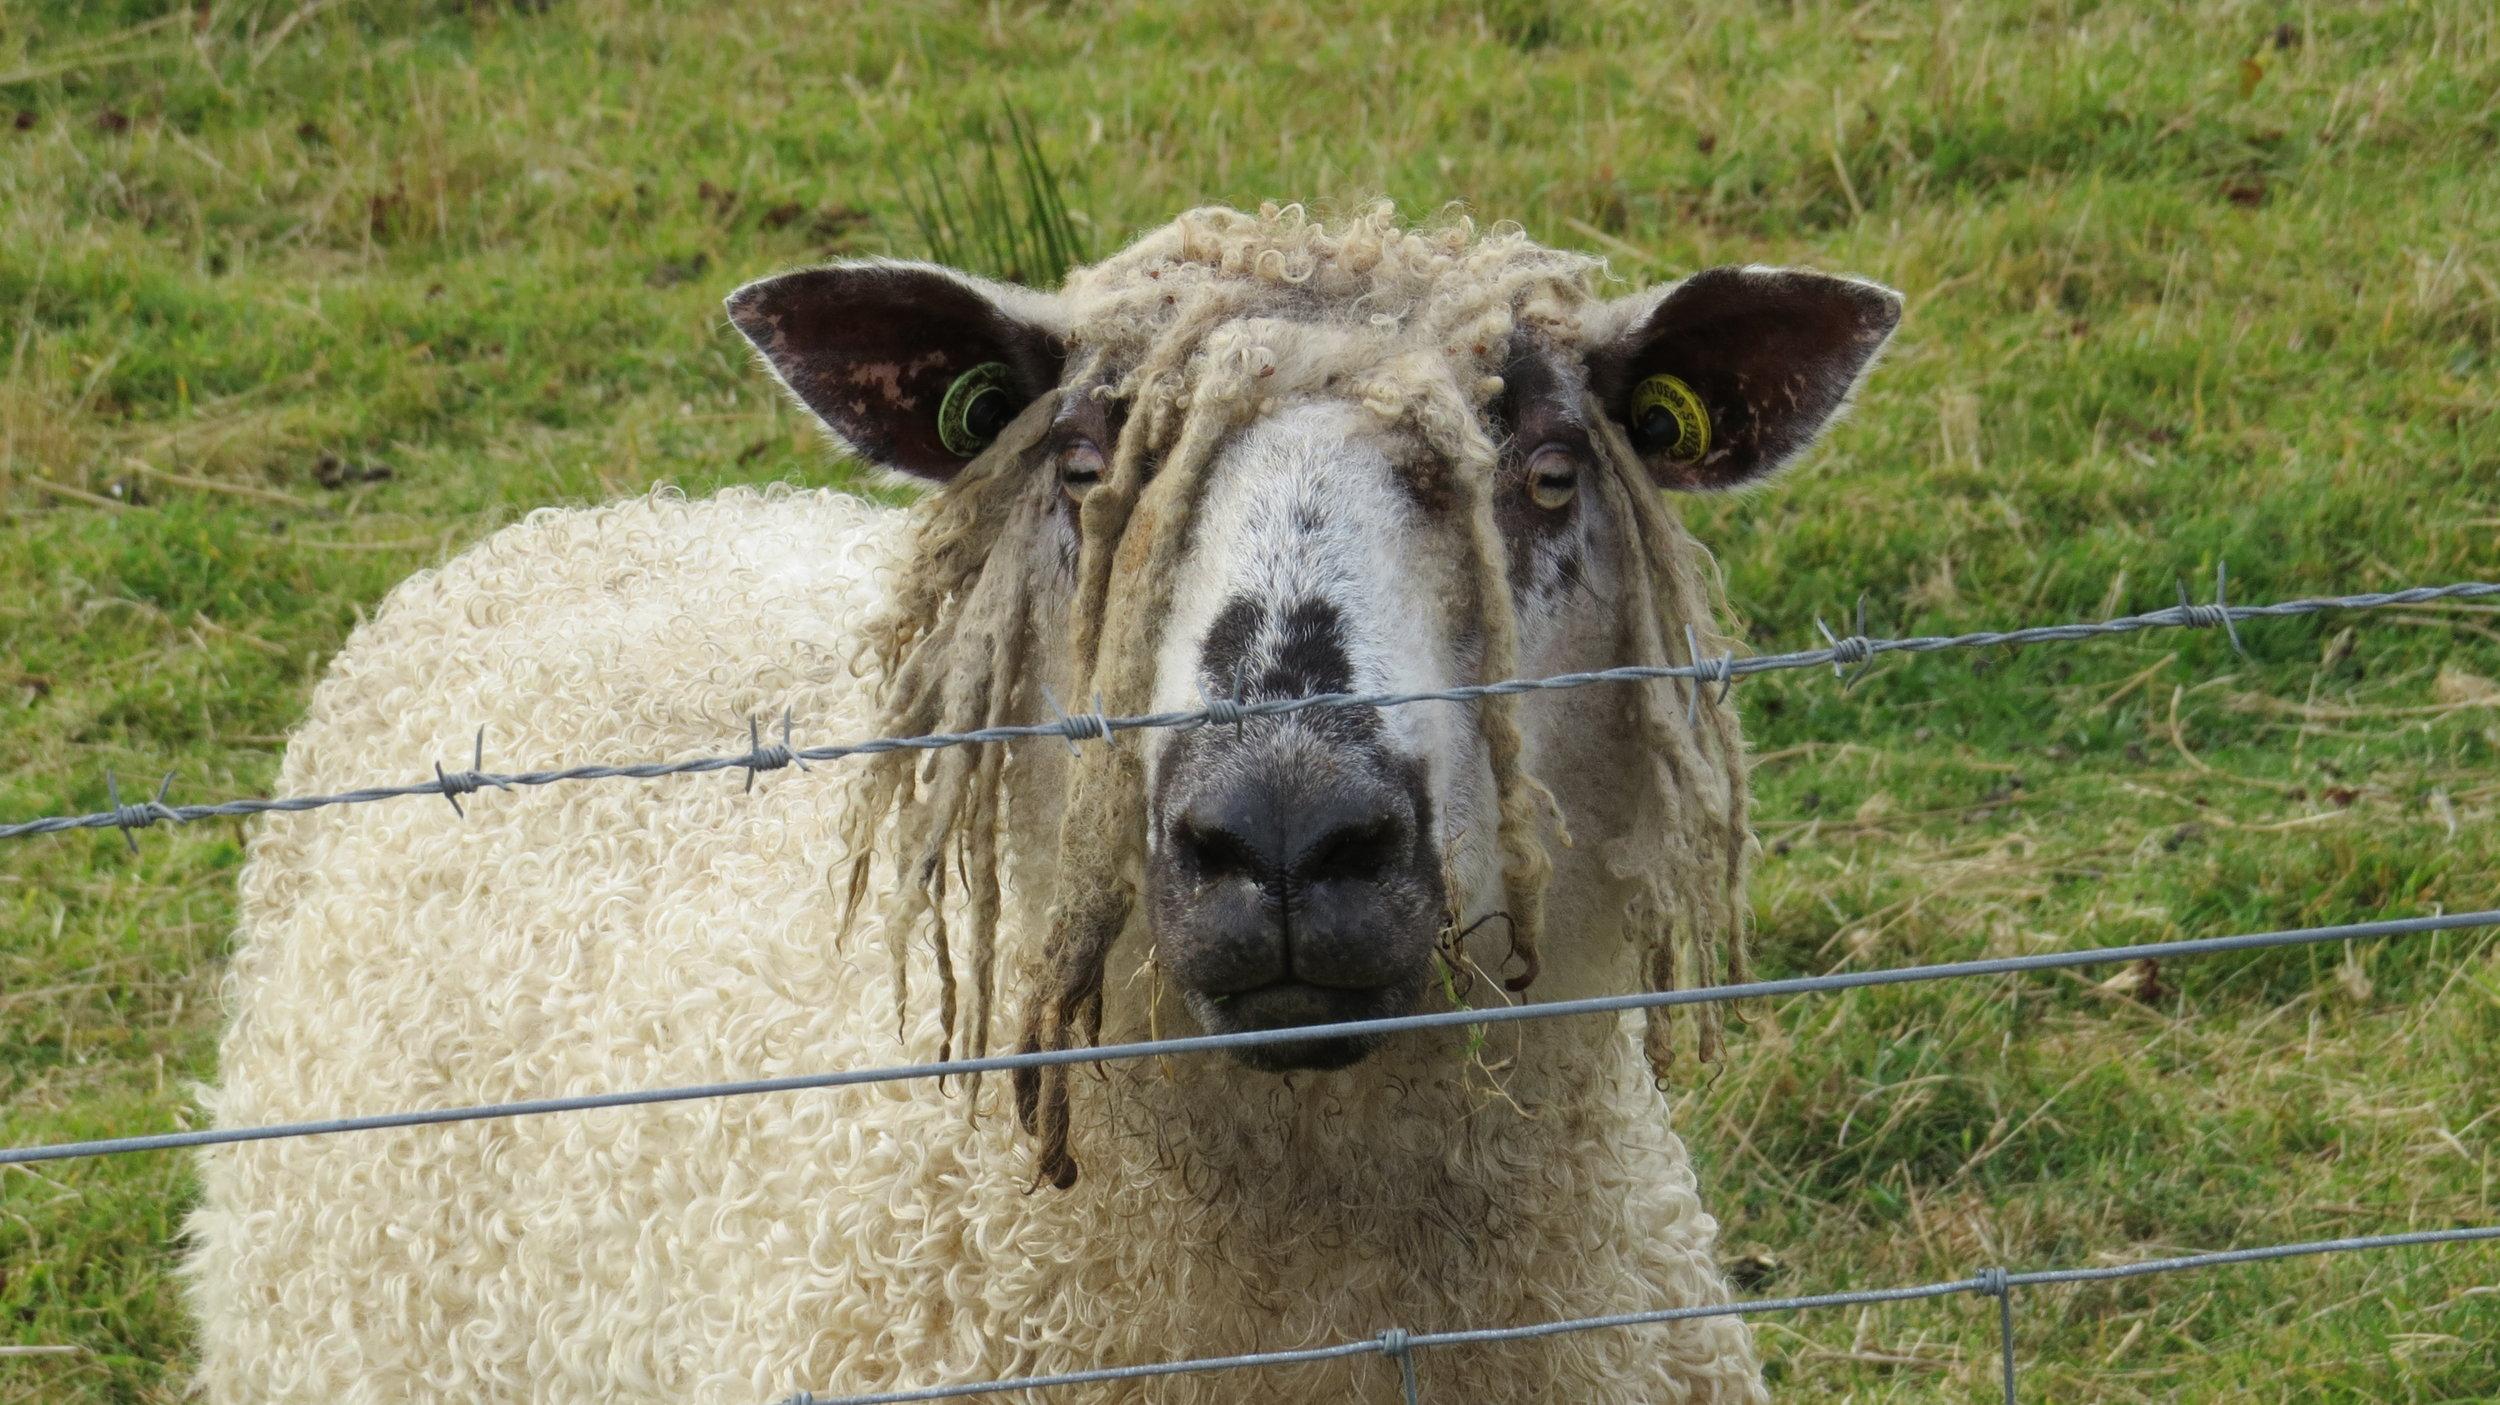 Dreadlocked Sheep